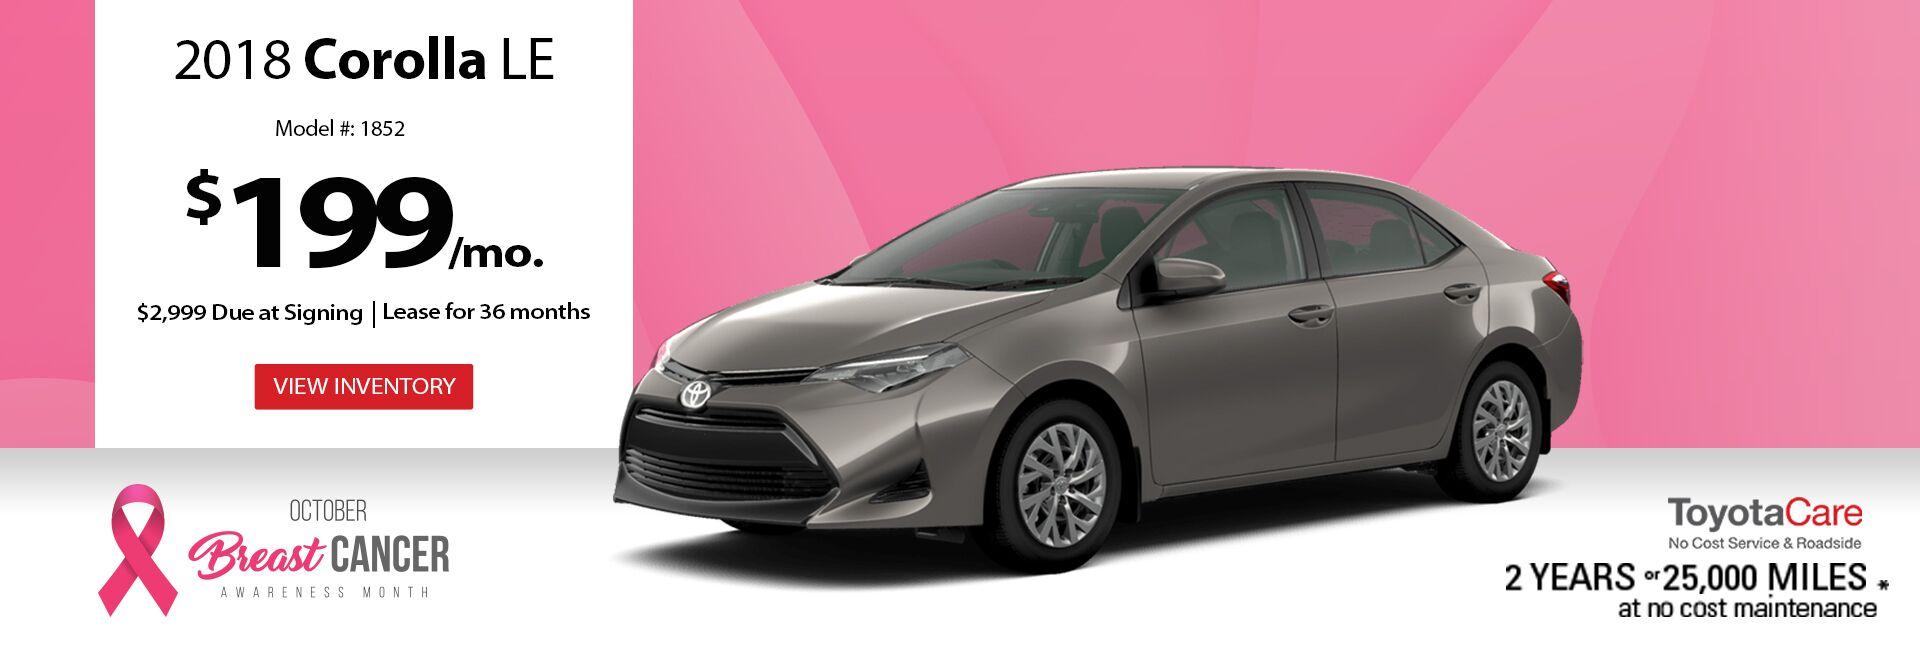 Toyota Dealership In Salisbury, MD | Pohanka Toyota Of Salisbury